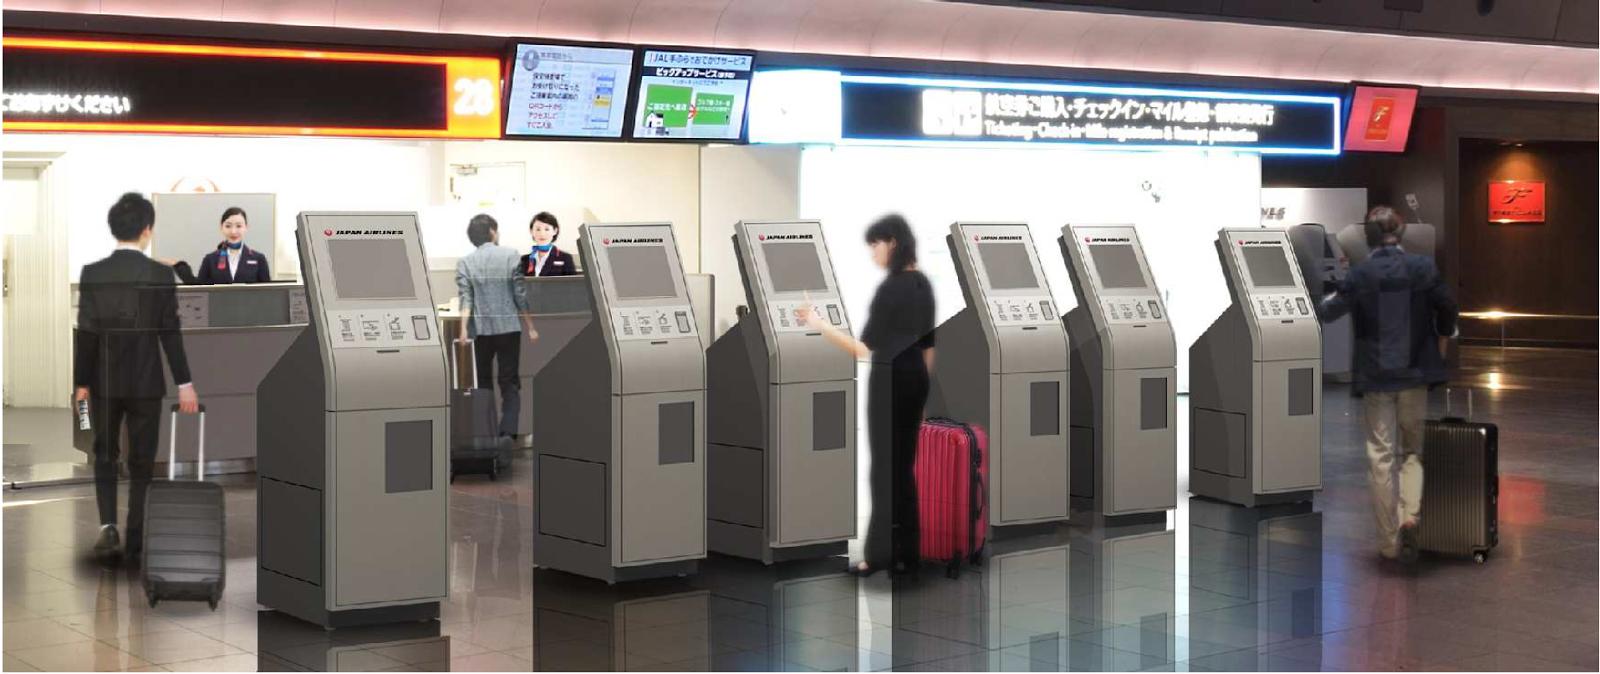 JAL self-tagging kiosks at Tokyo Haneda Terminal 1